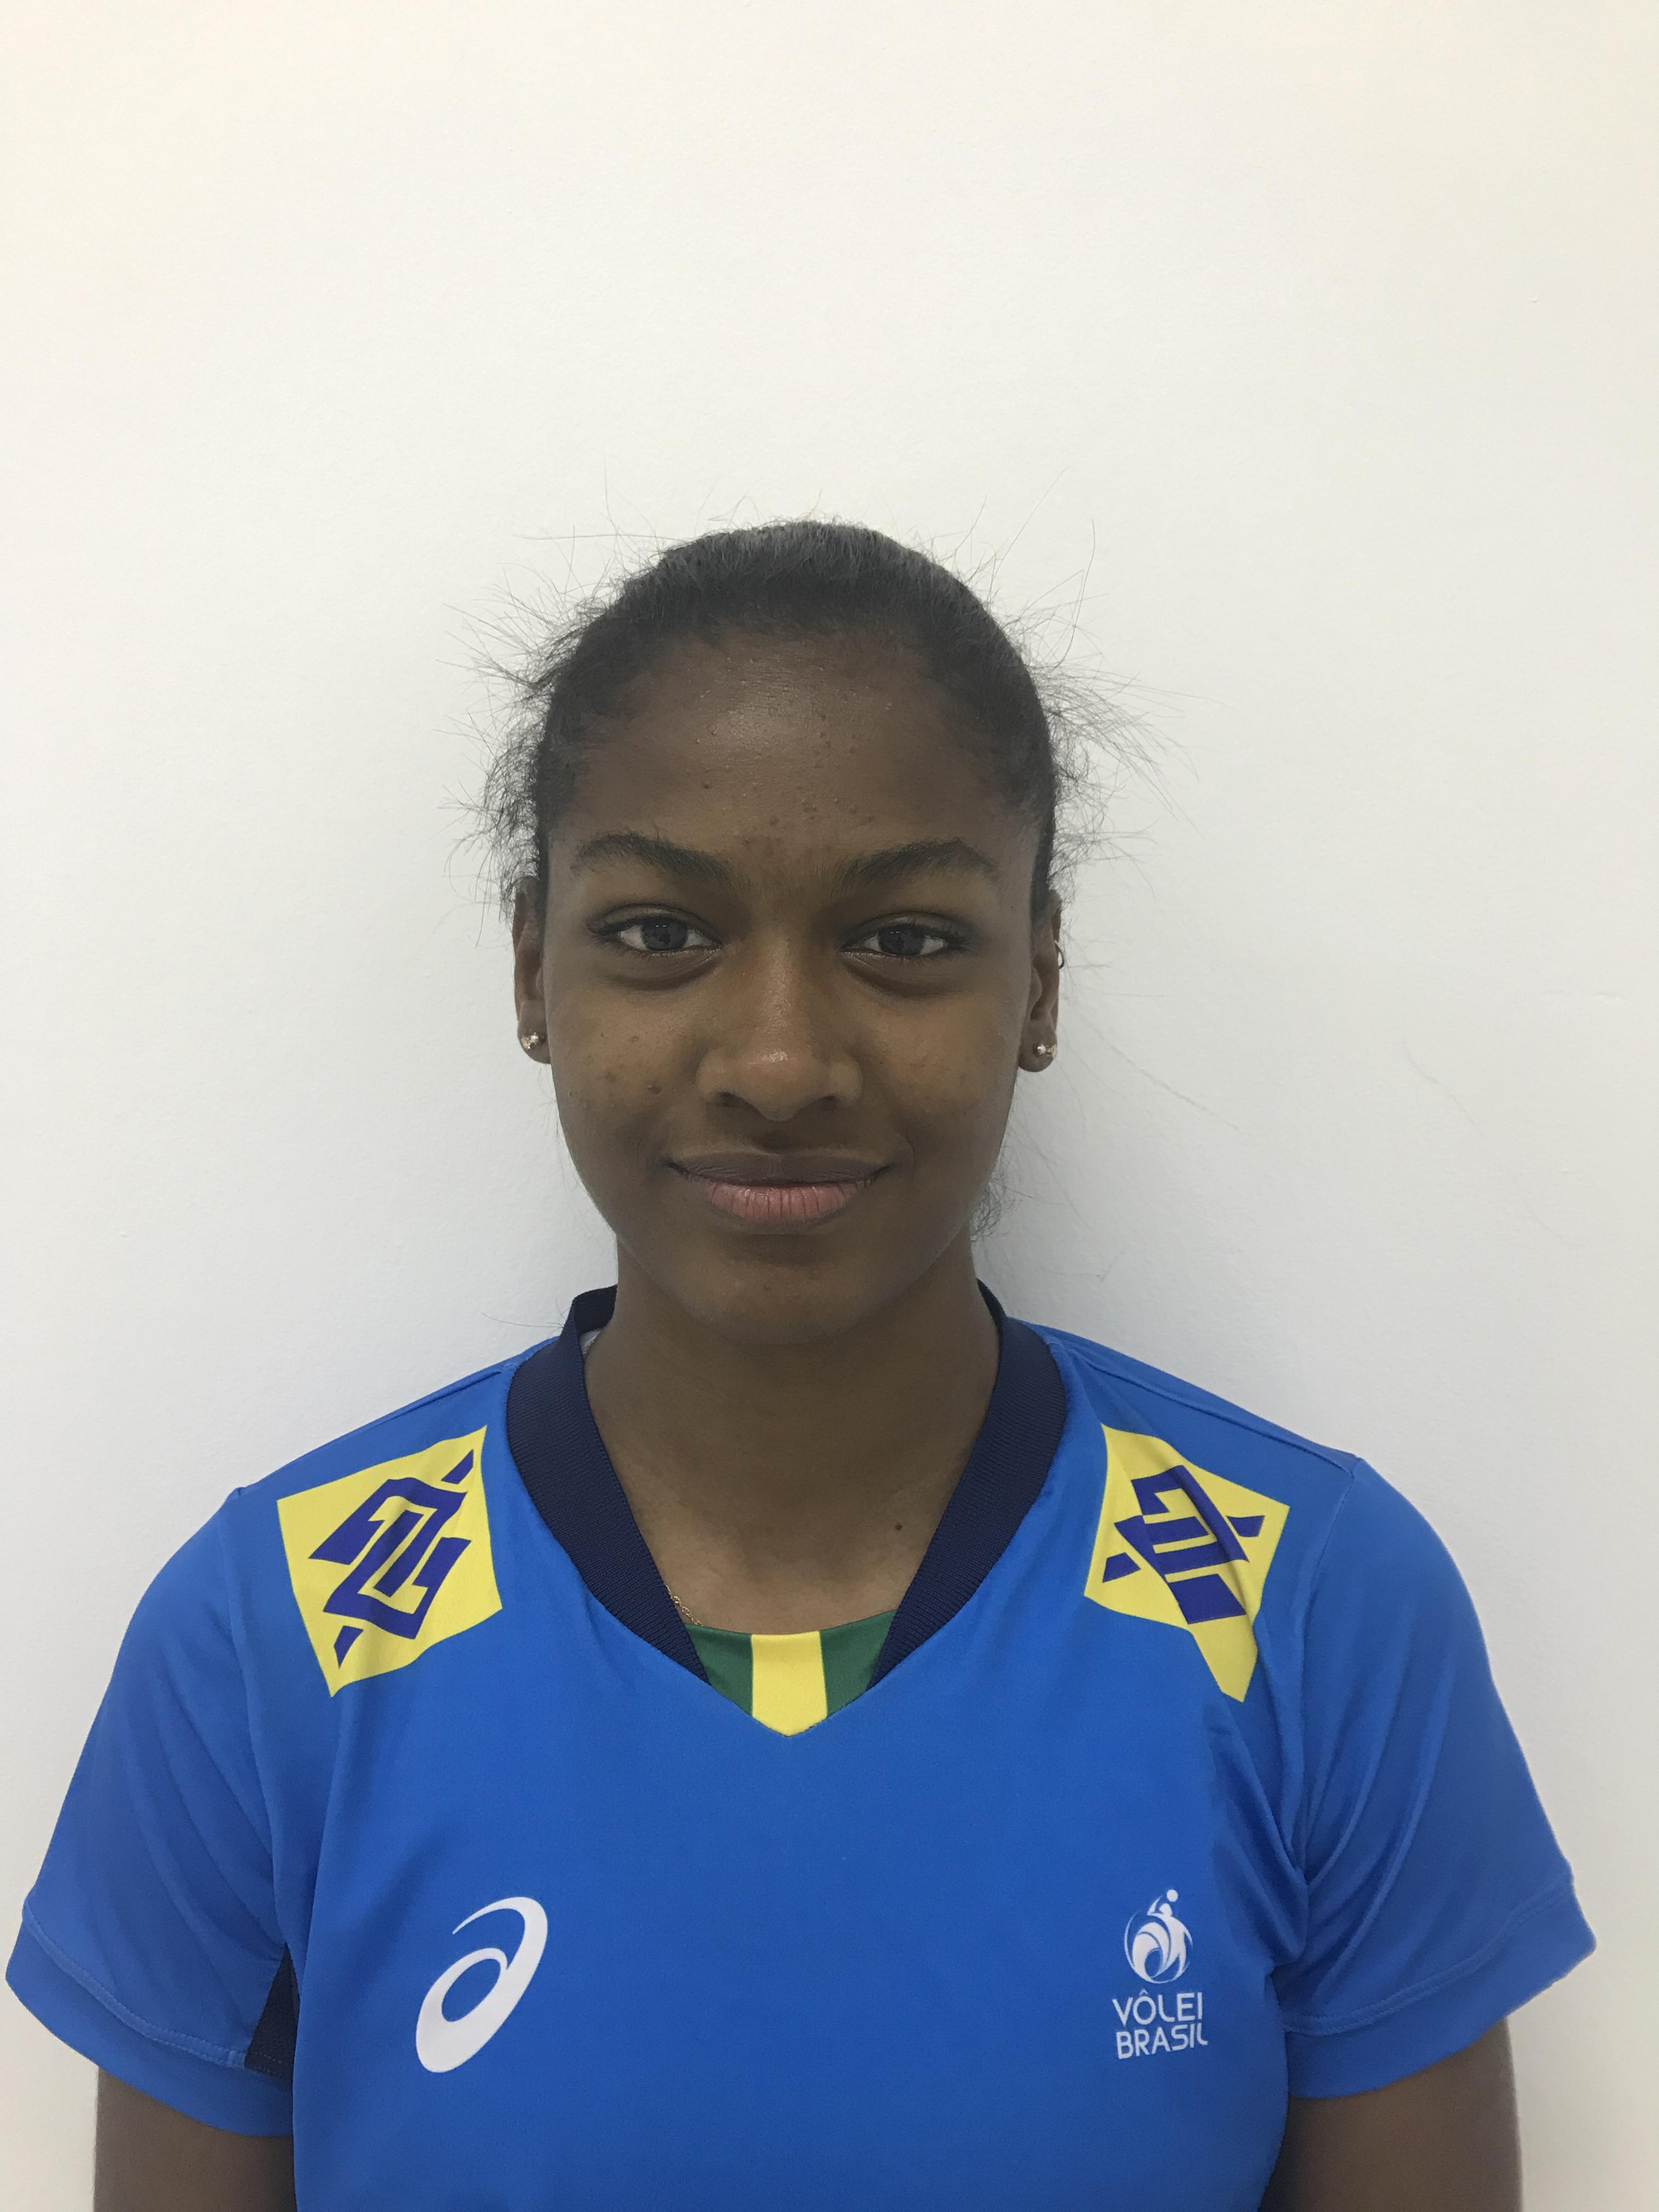 Mayany Souza